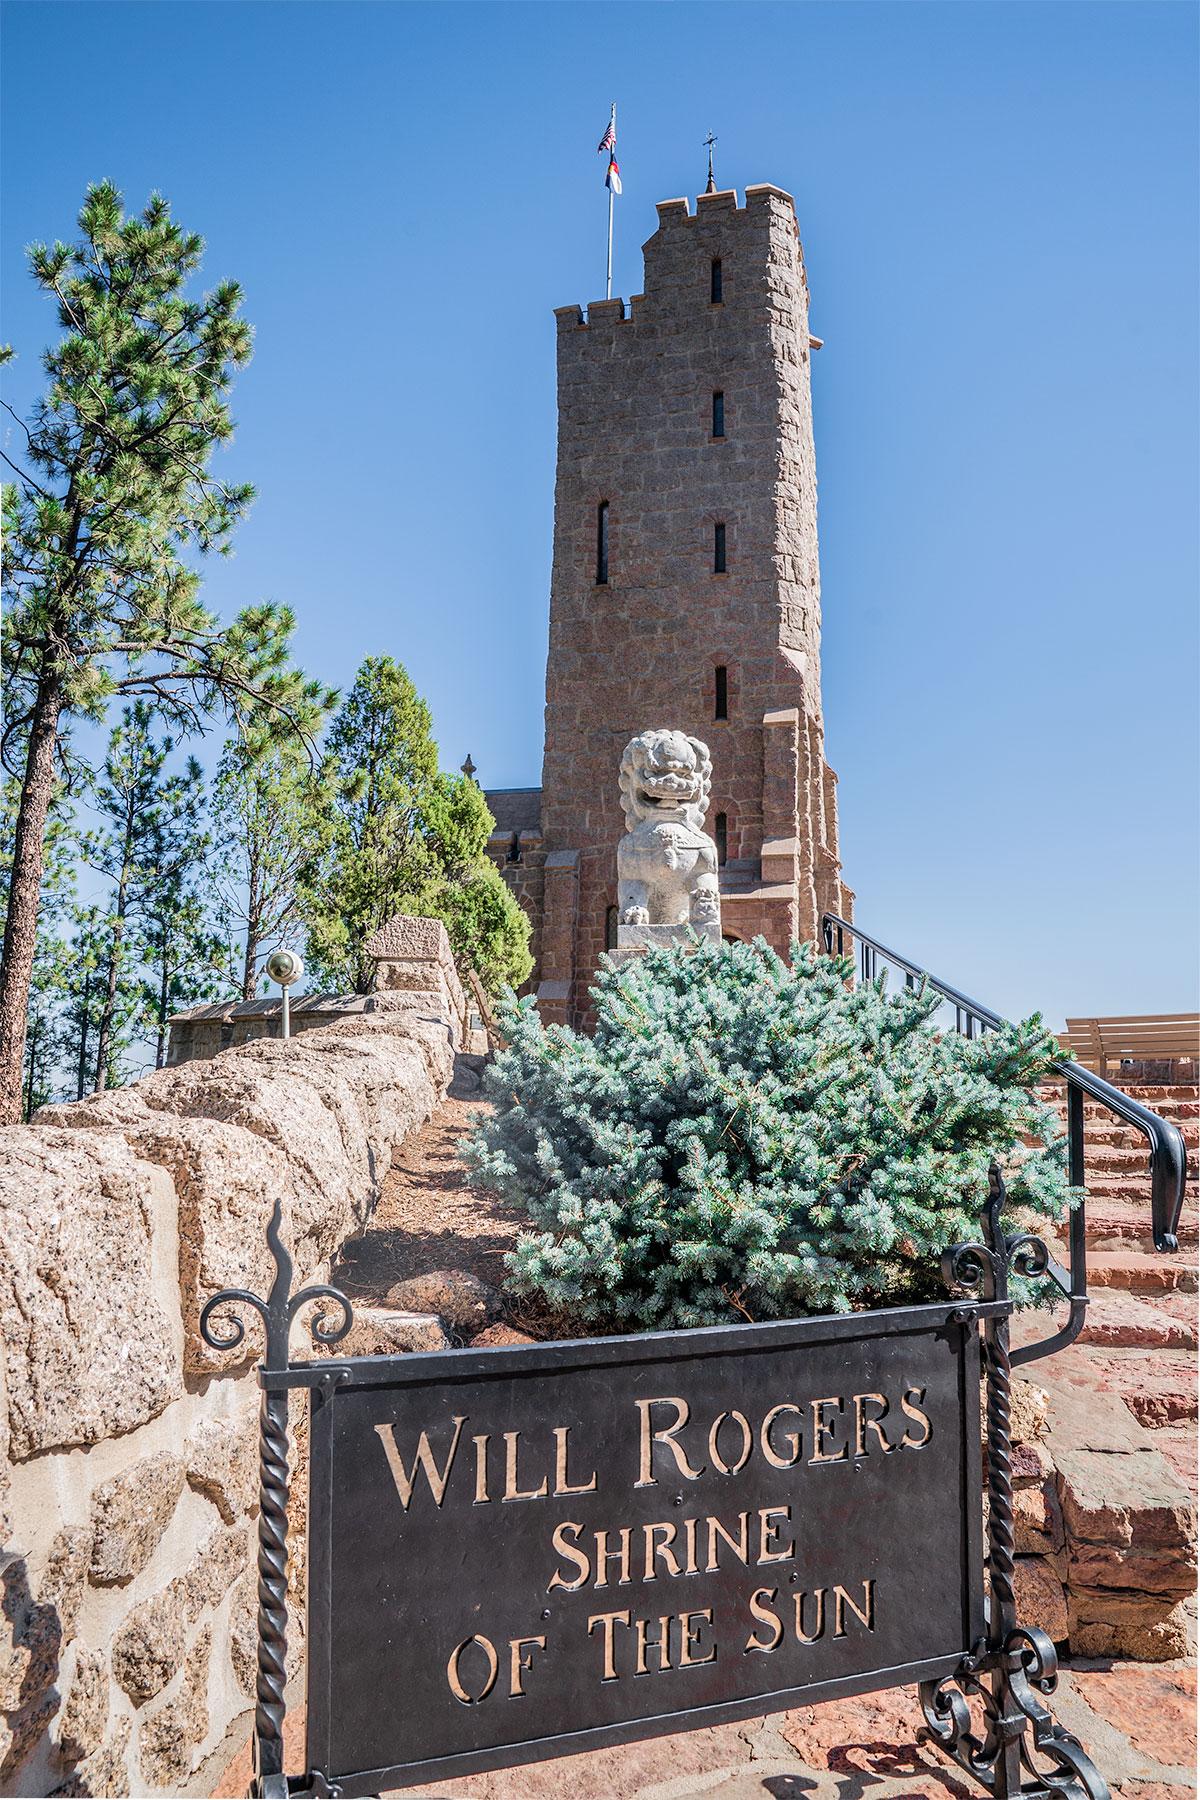 Colorado-Springs-and-Will-Rogers-Shrine-of-the-Sun-Colorado-Springs